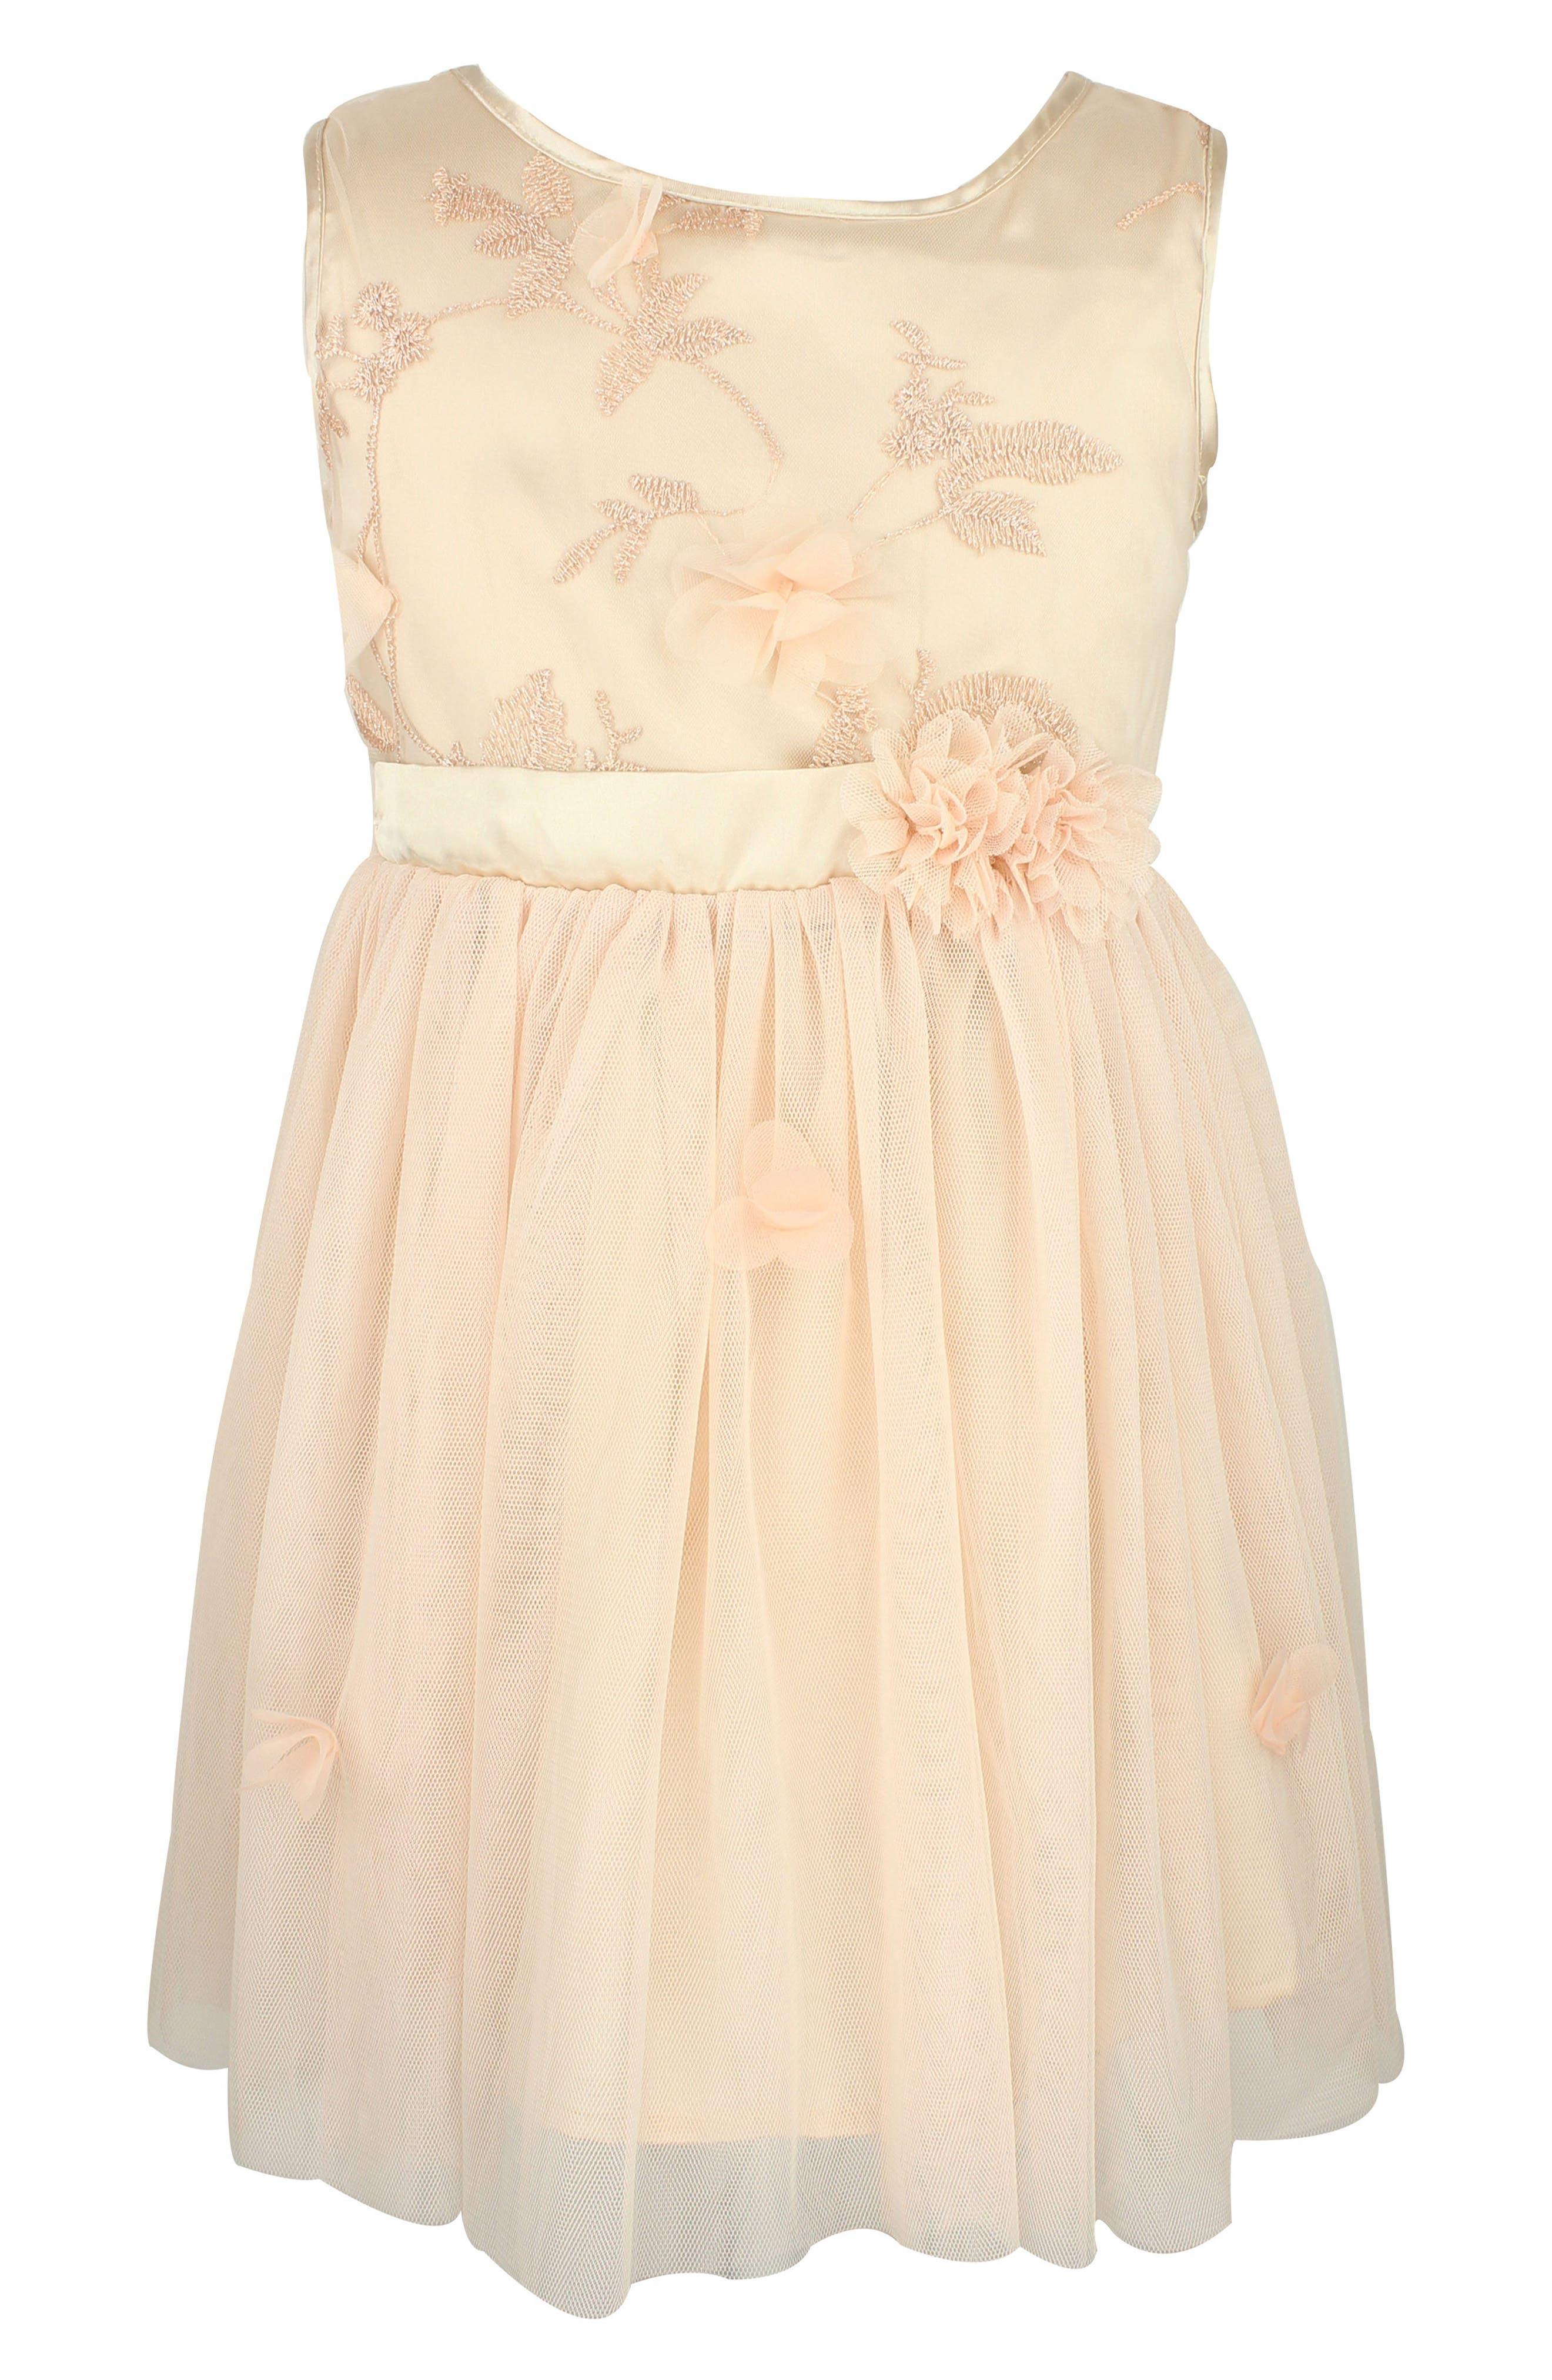 Flower Tulle Dress,                         Main,                         color, Ivory